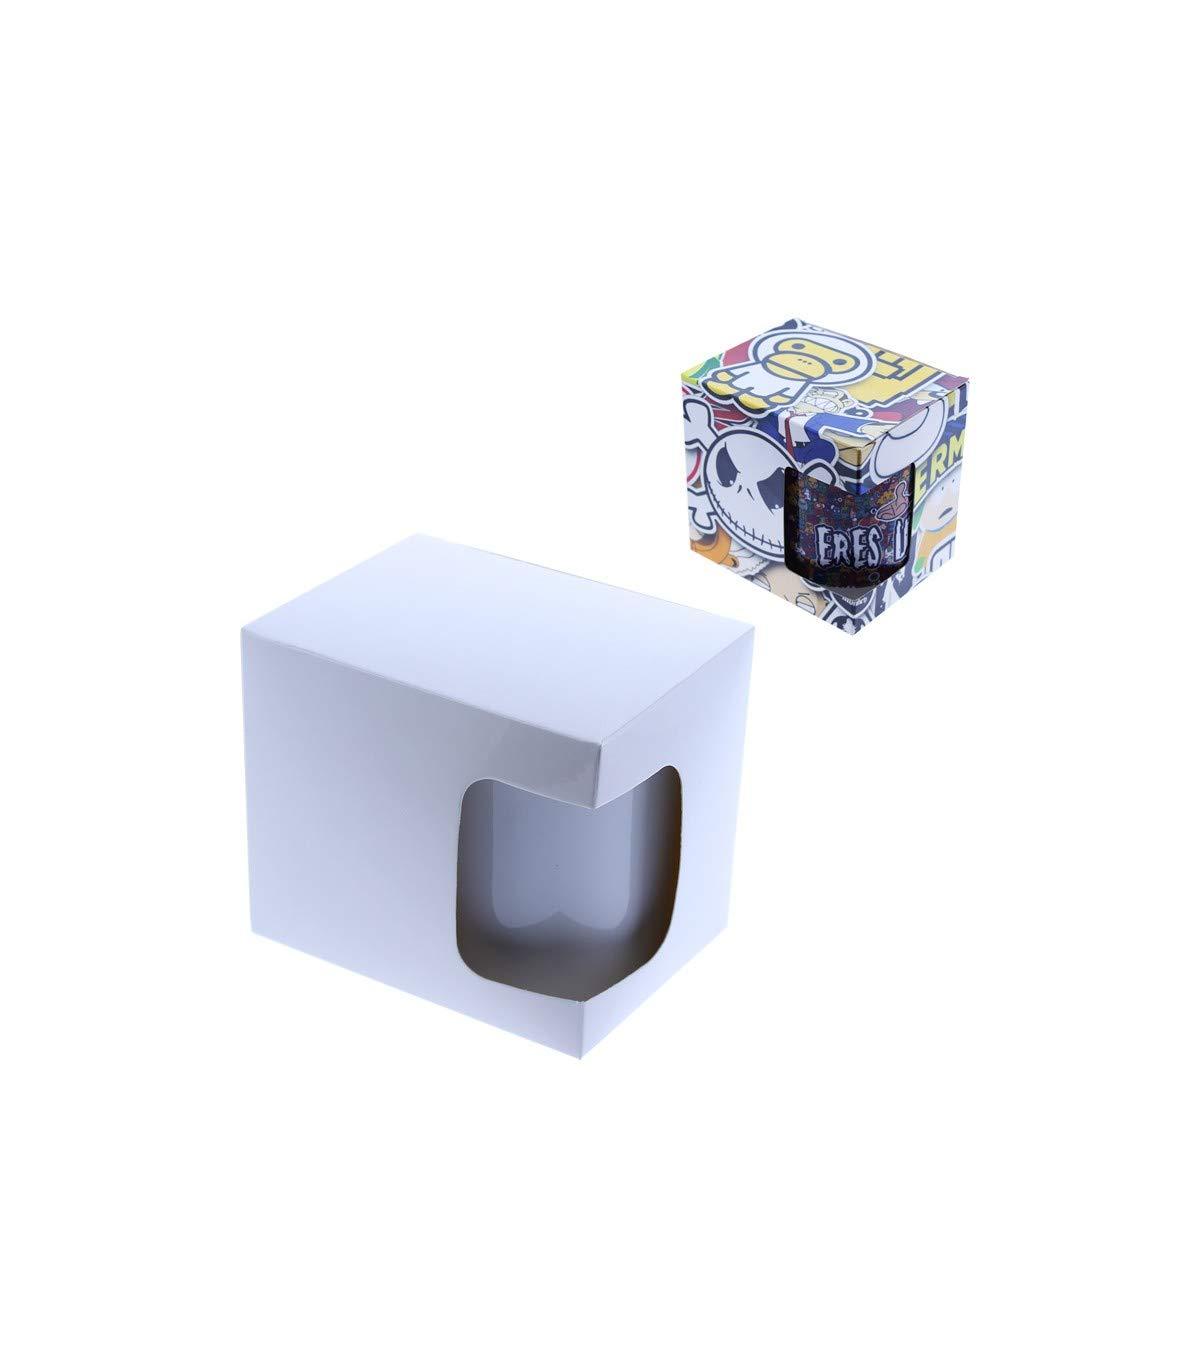 Grupo K-2 Caja Sublimable Para Tazas De Sublimación: Amazon.es: Hogar